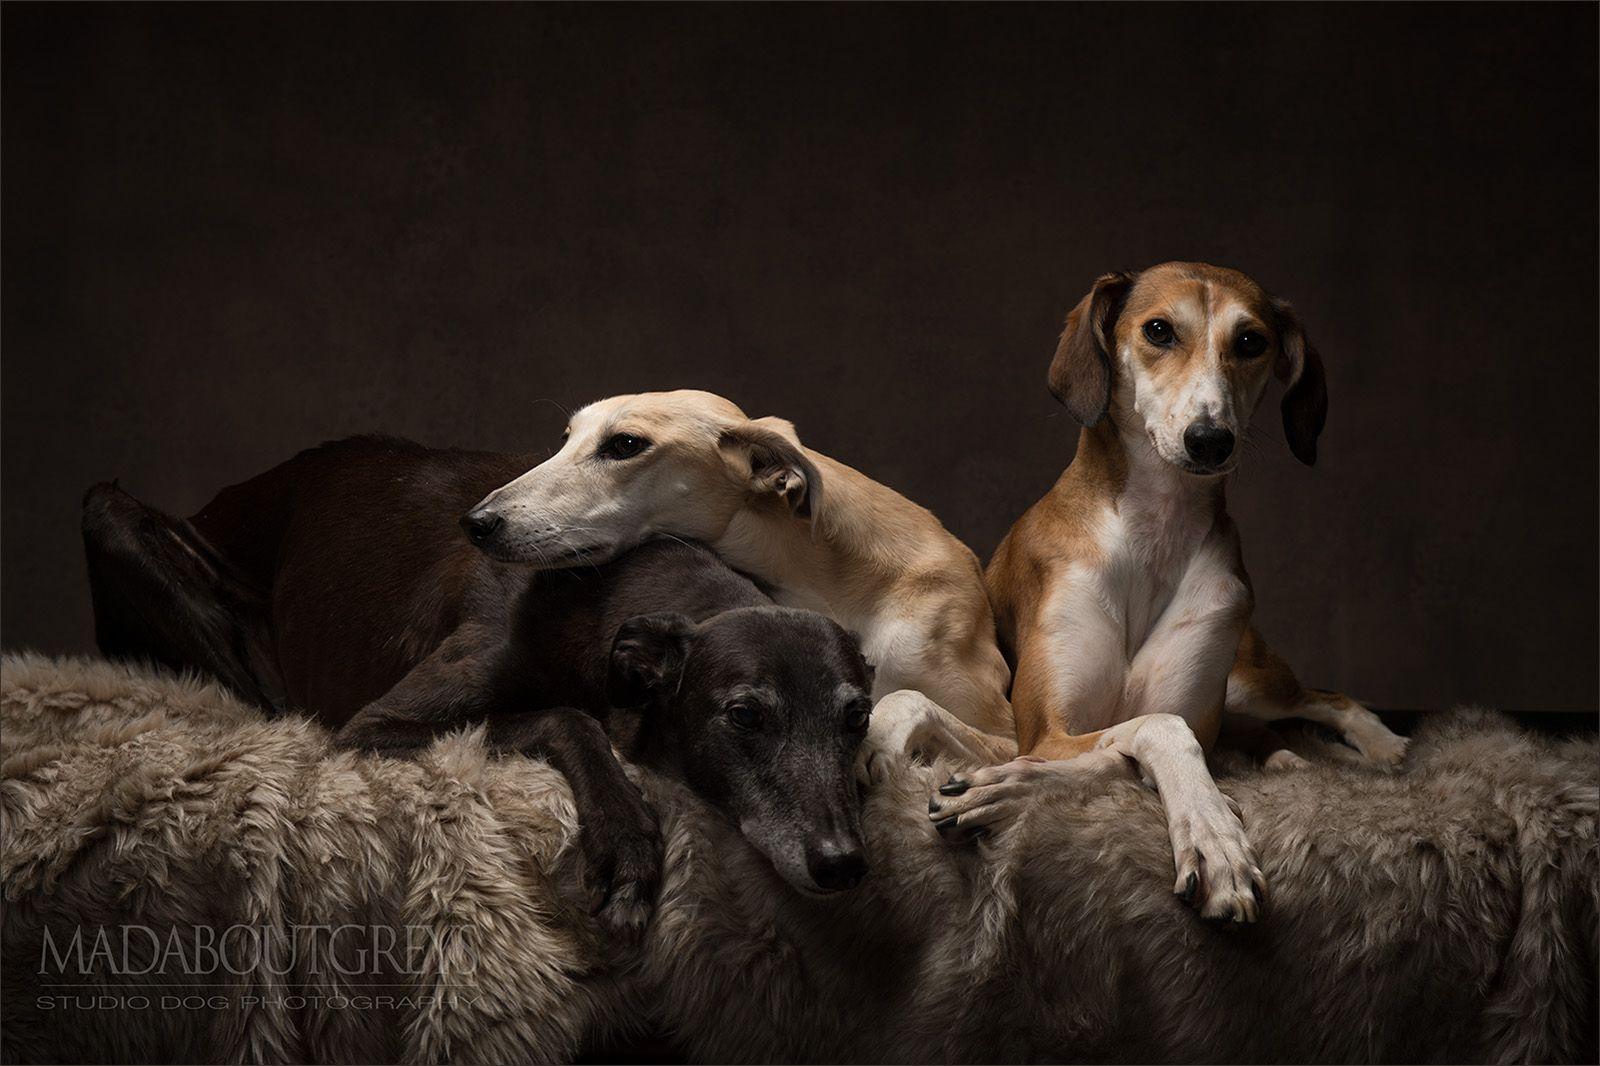 World Galgo Day 2017 Greyhound Dog Photograph Hound